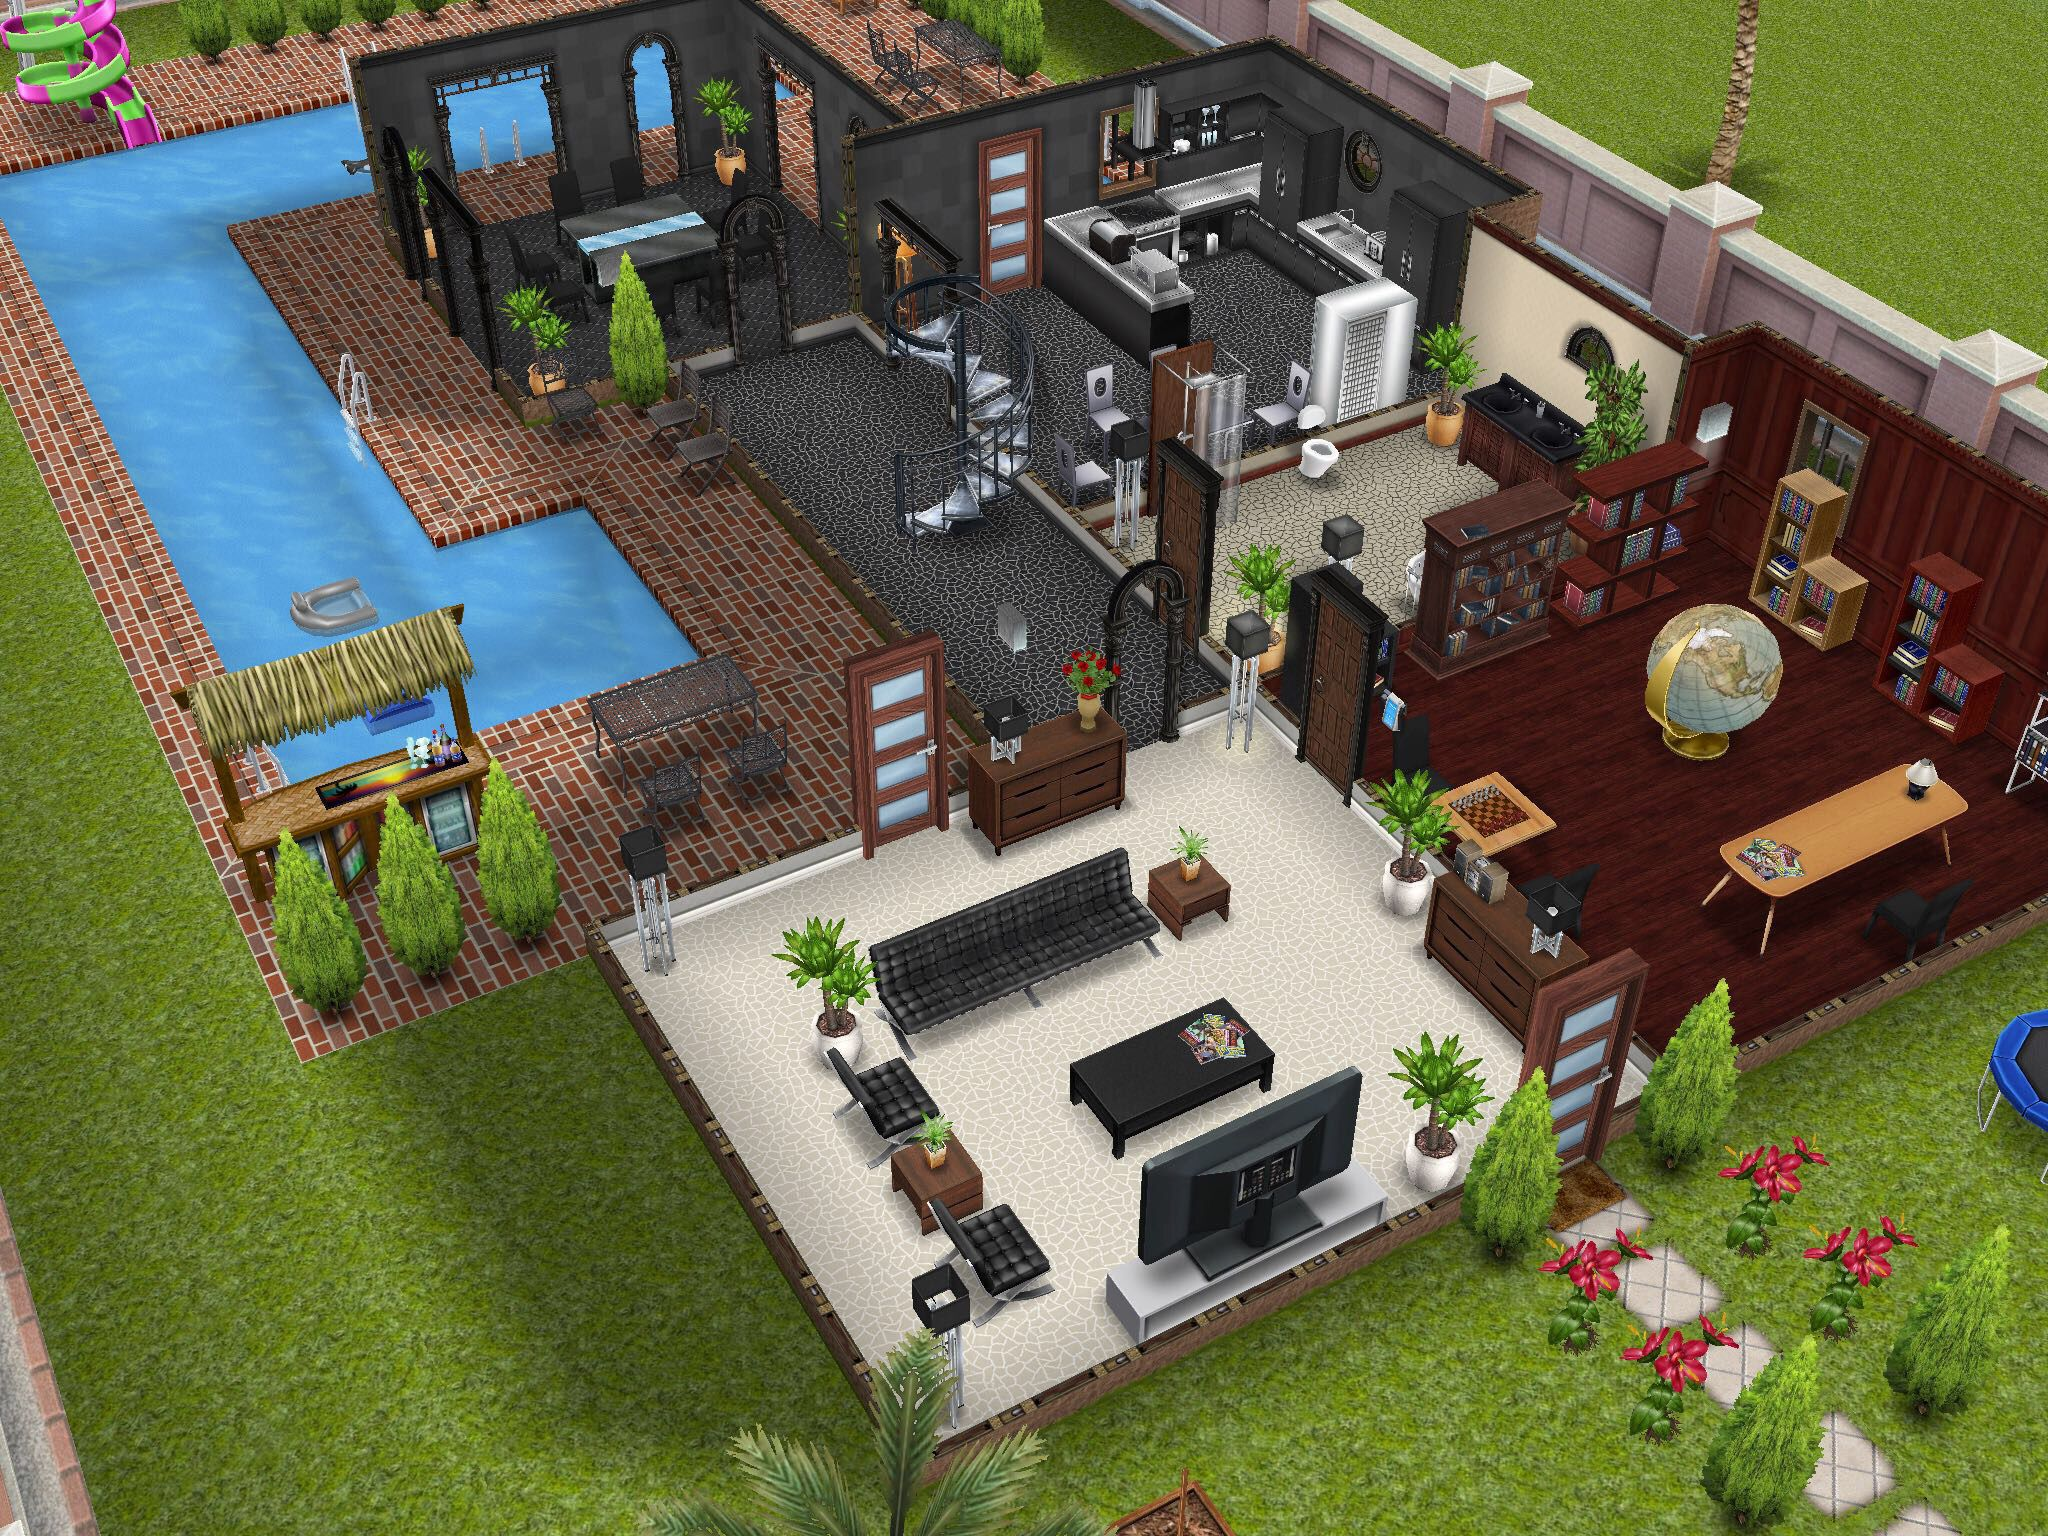 Pin On Sims Freeplay Design Ideas